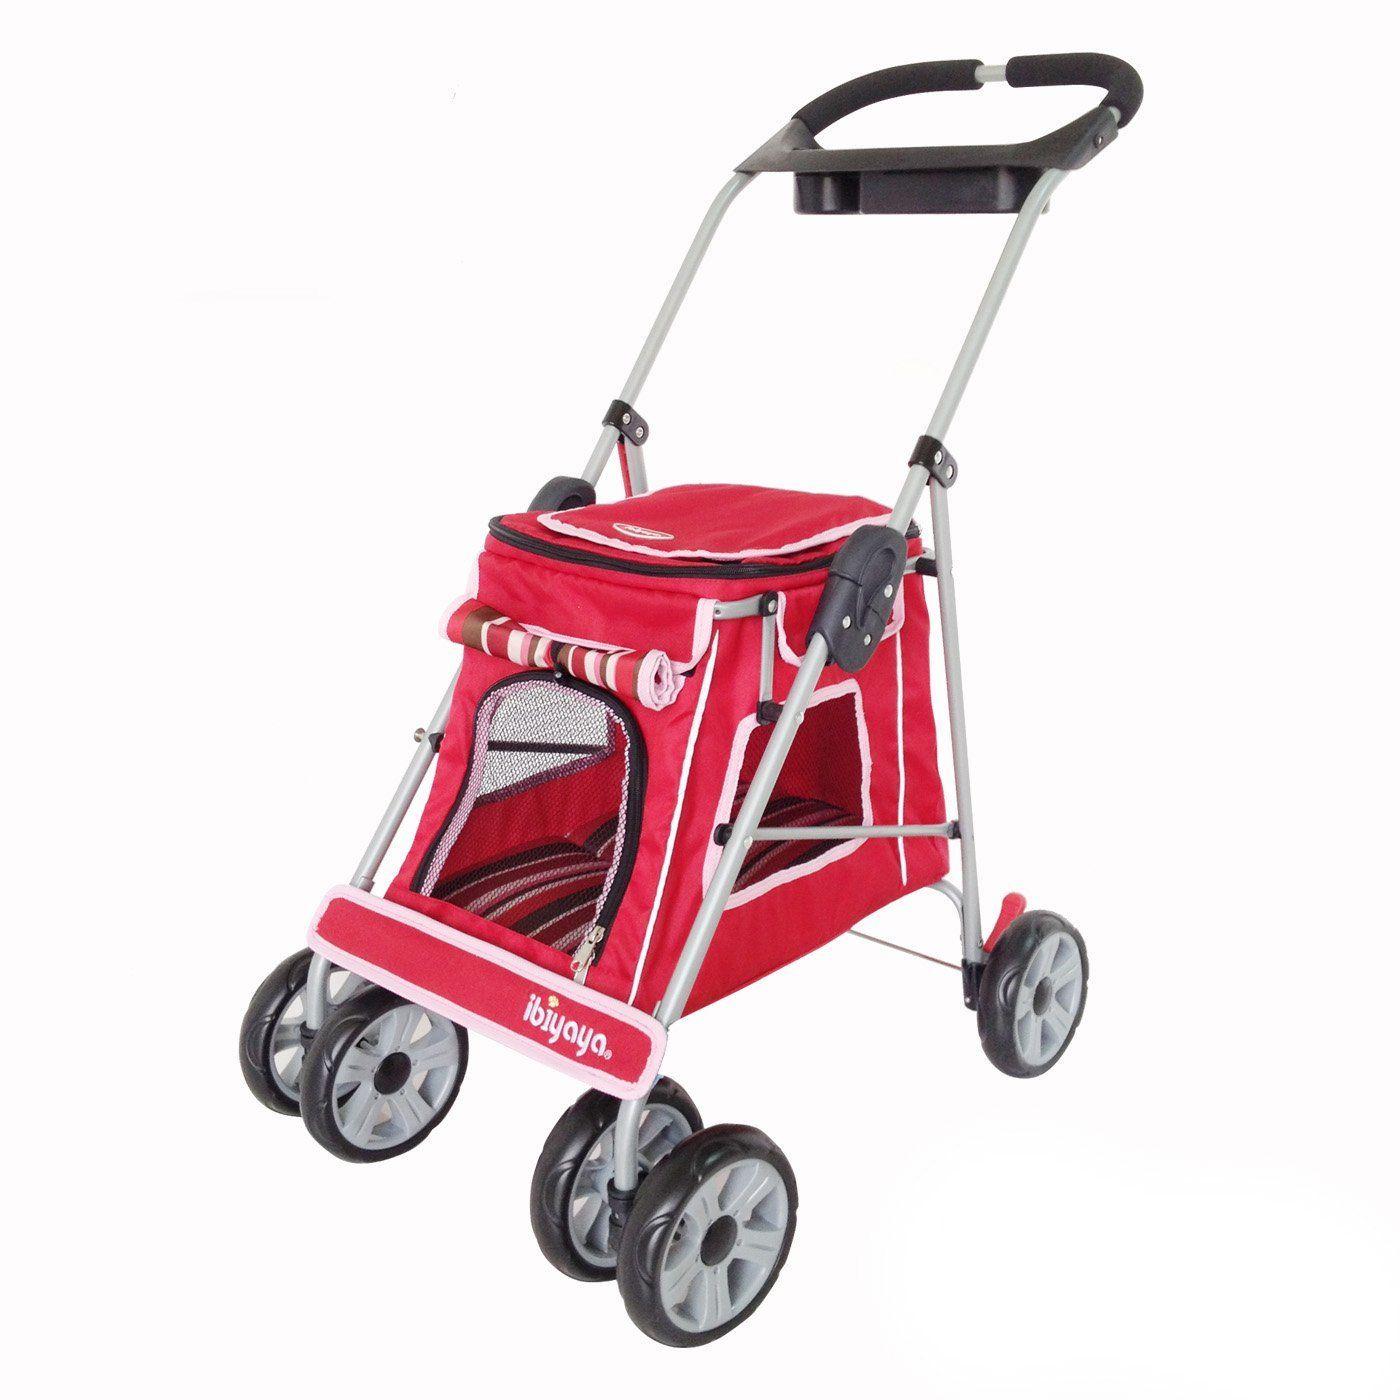 Ibiyaya Pet Stroller City Elite Buggy * Tried it! Love it